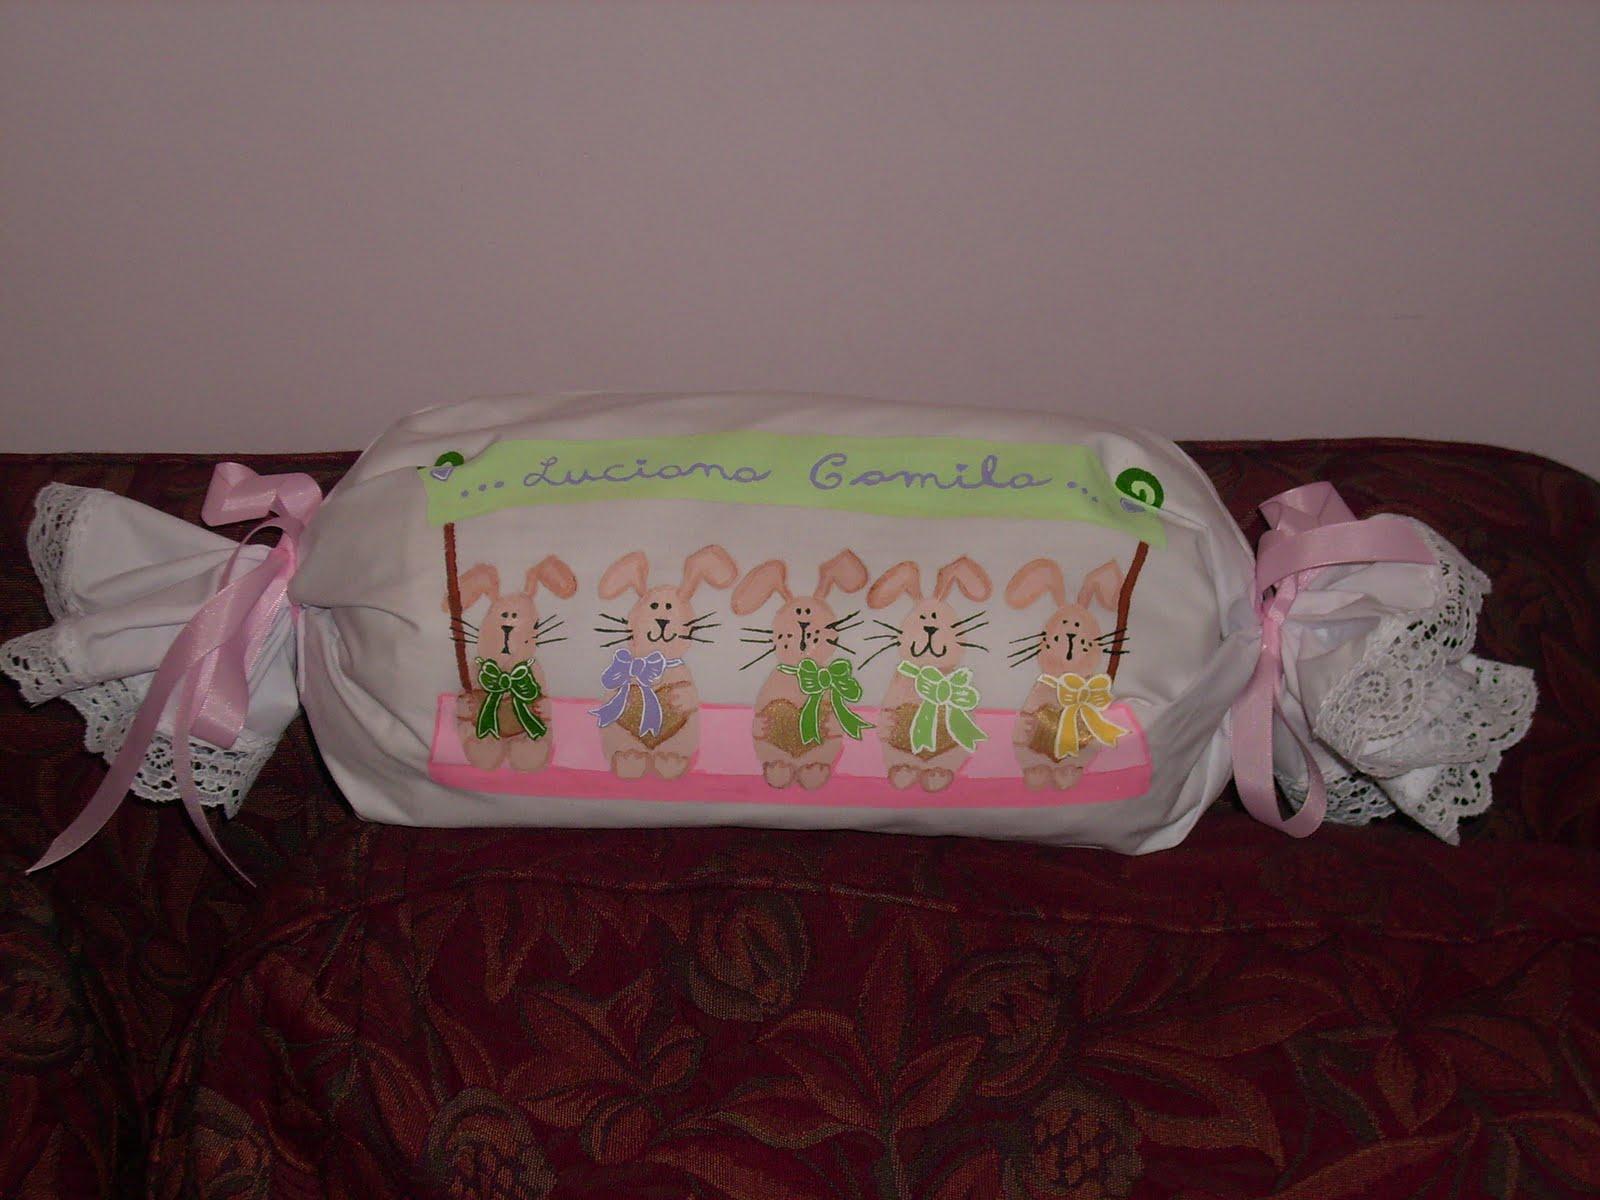 Set De Baño Souvenirs: Fría, Madera y Tela: Almohada Caramelo & Set de Baño & Reloj